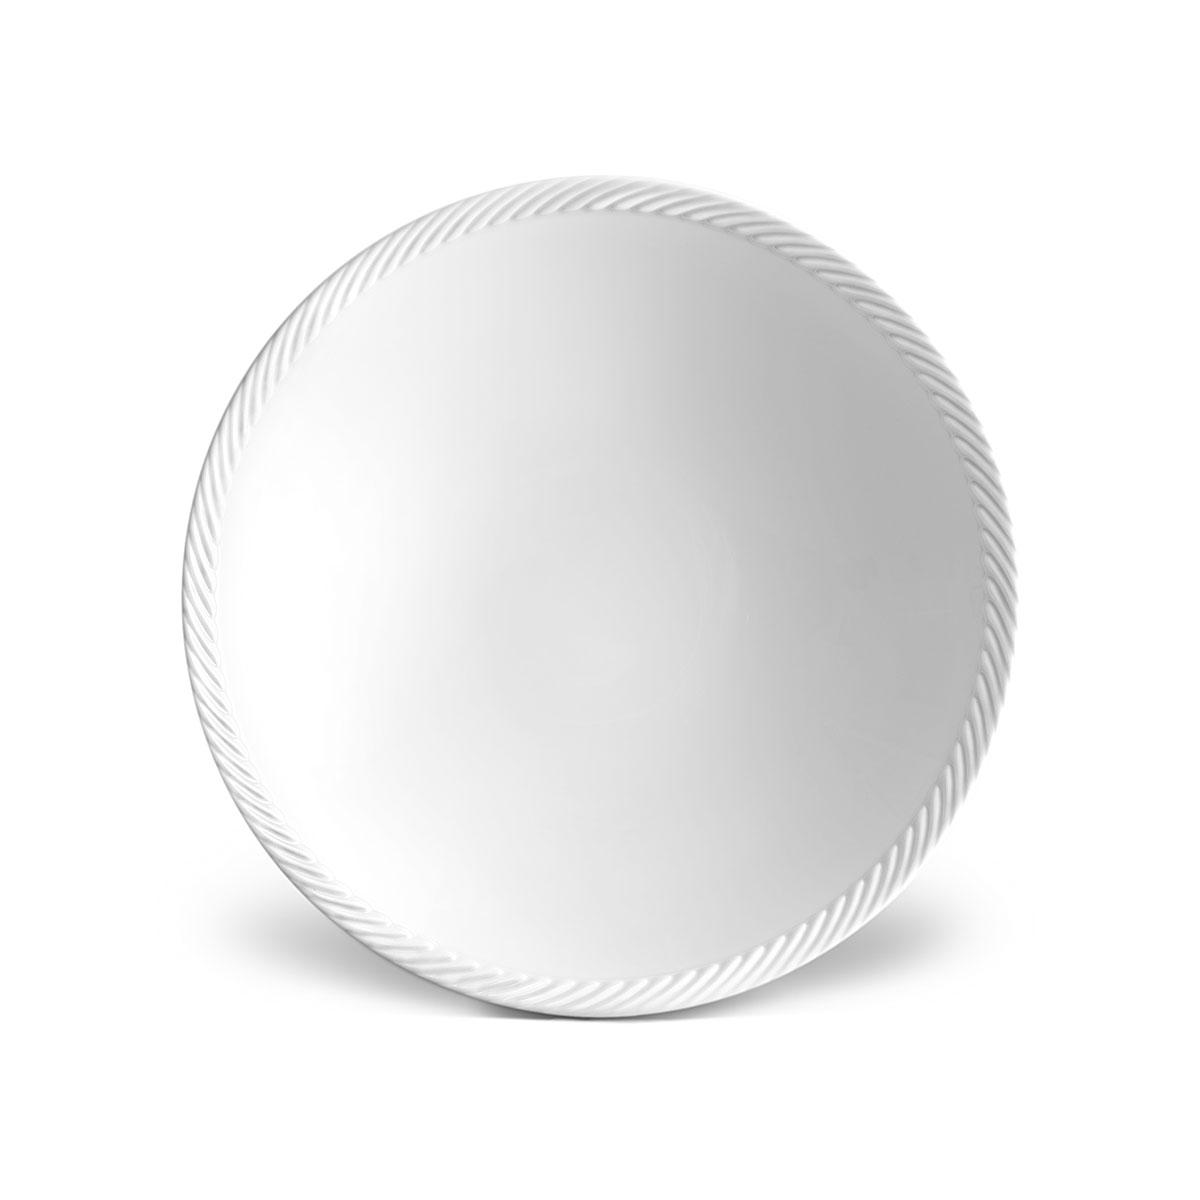 L'Objet I Corde Soup Plate White